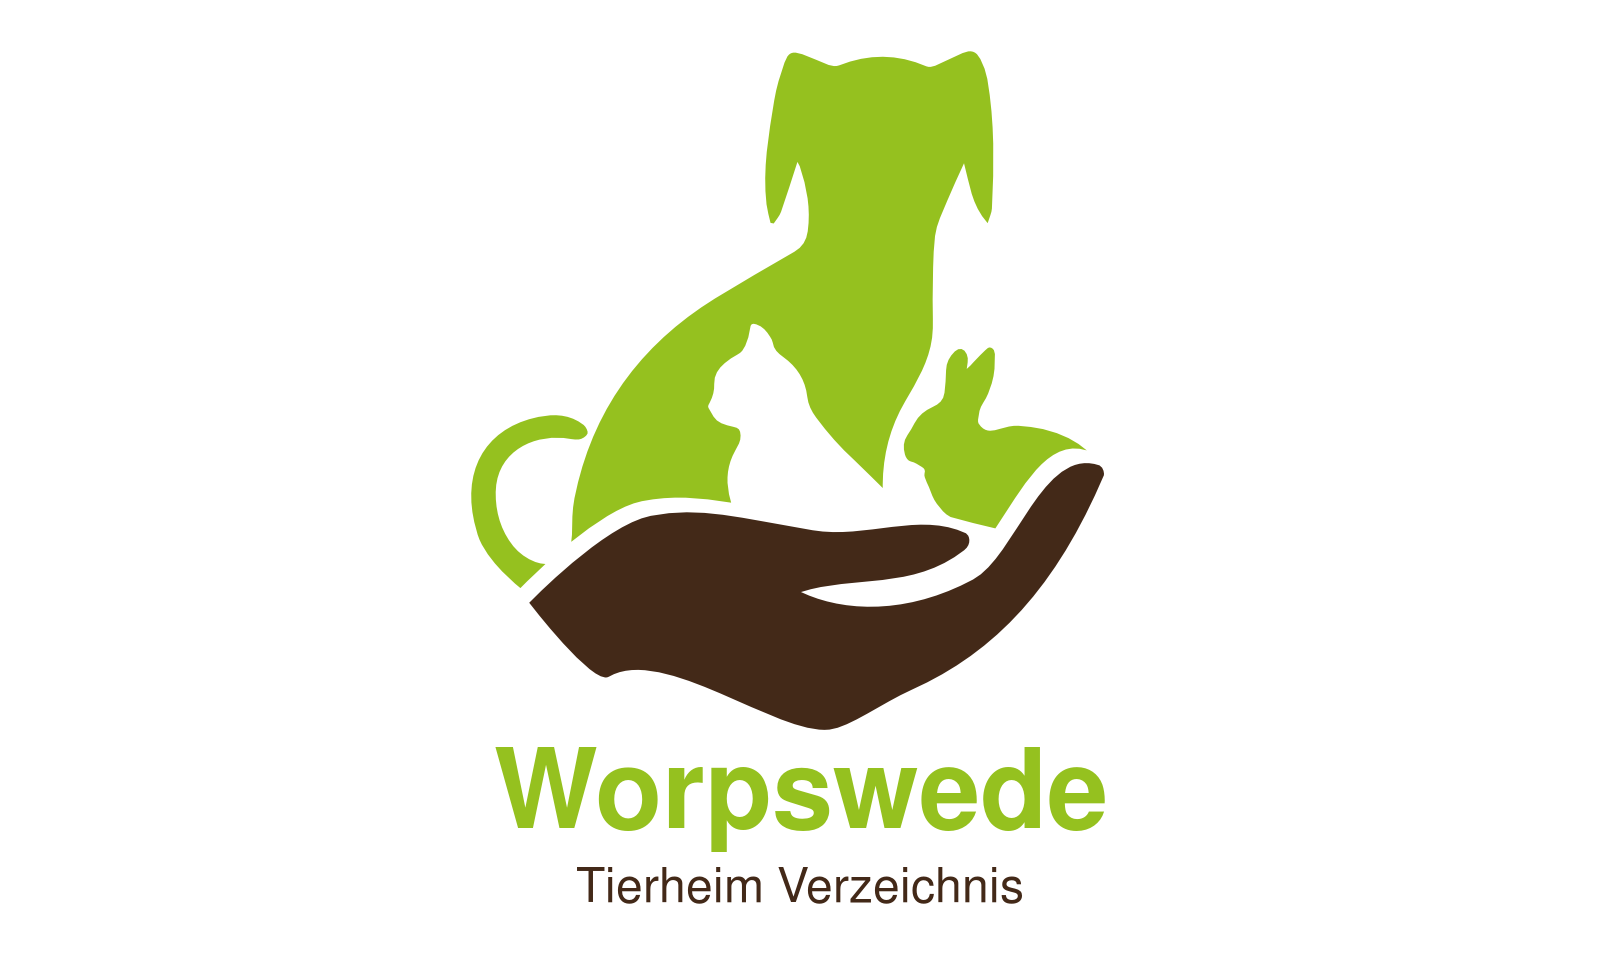 Tierheim Worpswede